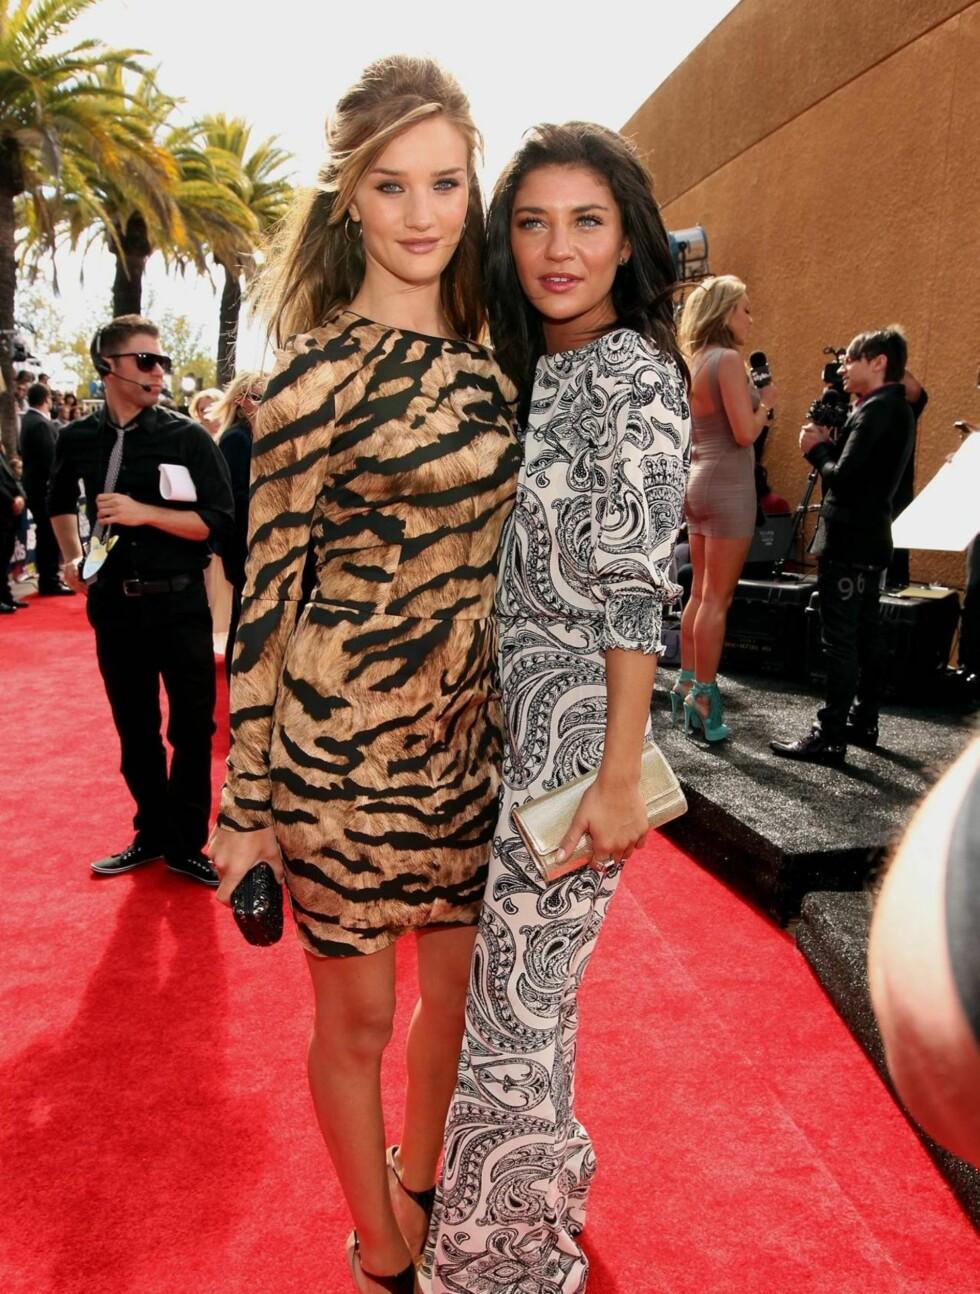 <strong>TIGER-MØNSTRE:</strong>  Rosie Huntington-Whiteley (t.v.) fra den nye «Transfornmers»-filmen ankom i en tiger-mønstret Dolce & Gabbana kjole. Her poserer hun sammen med Jessica Szohr fra TV-serien «Gossip Girl», som kom i kjole fra Alice+Olivia. Foto: All Over Press